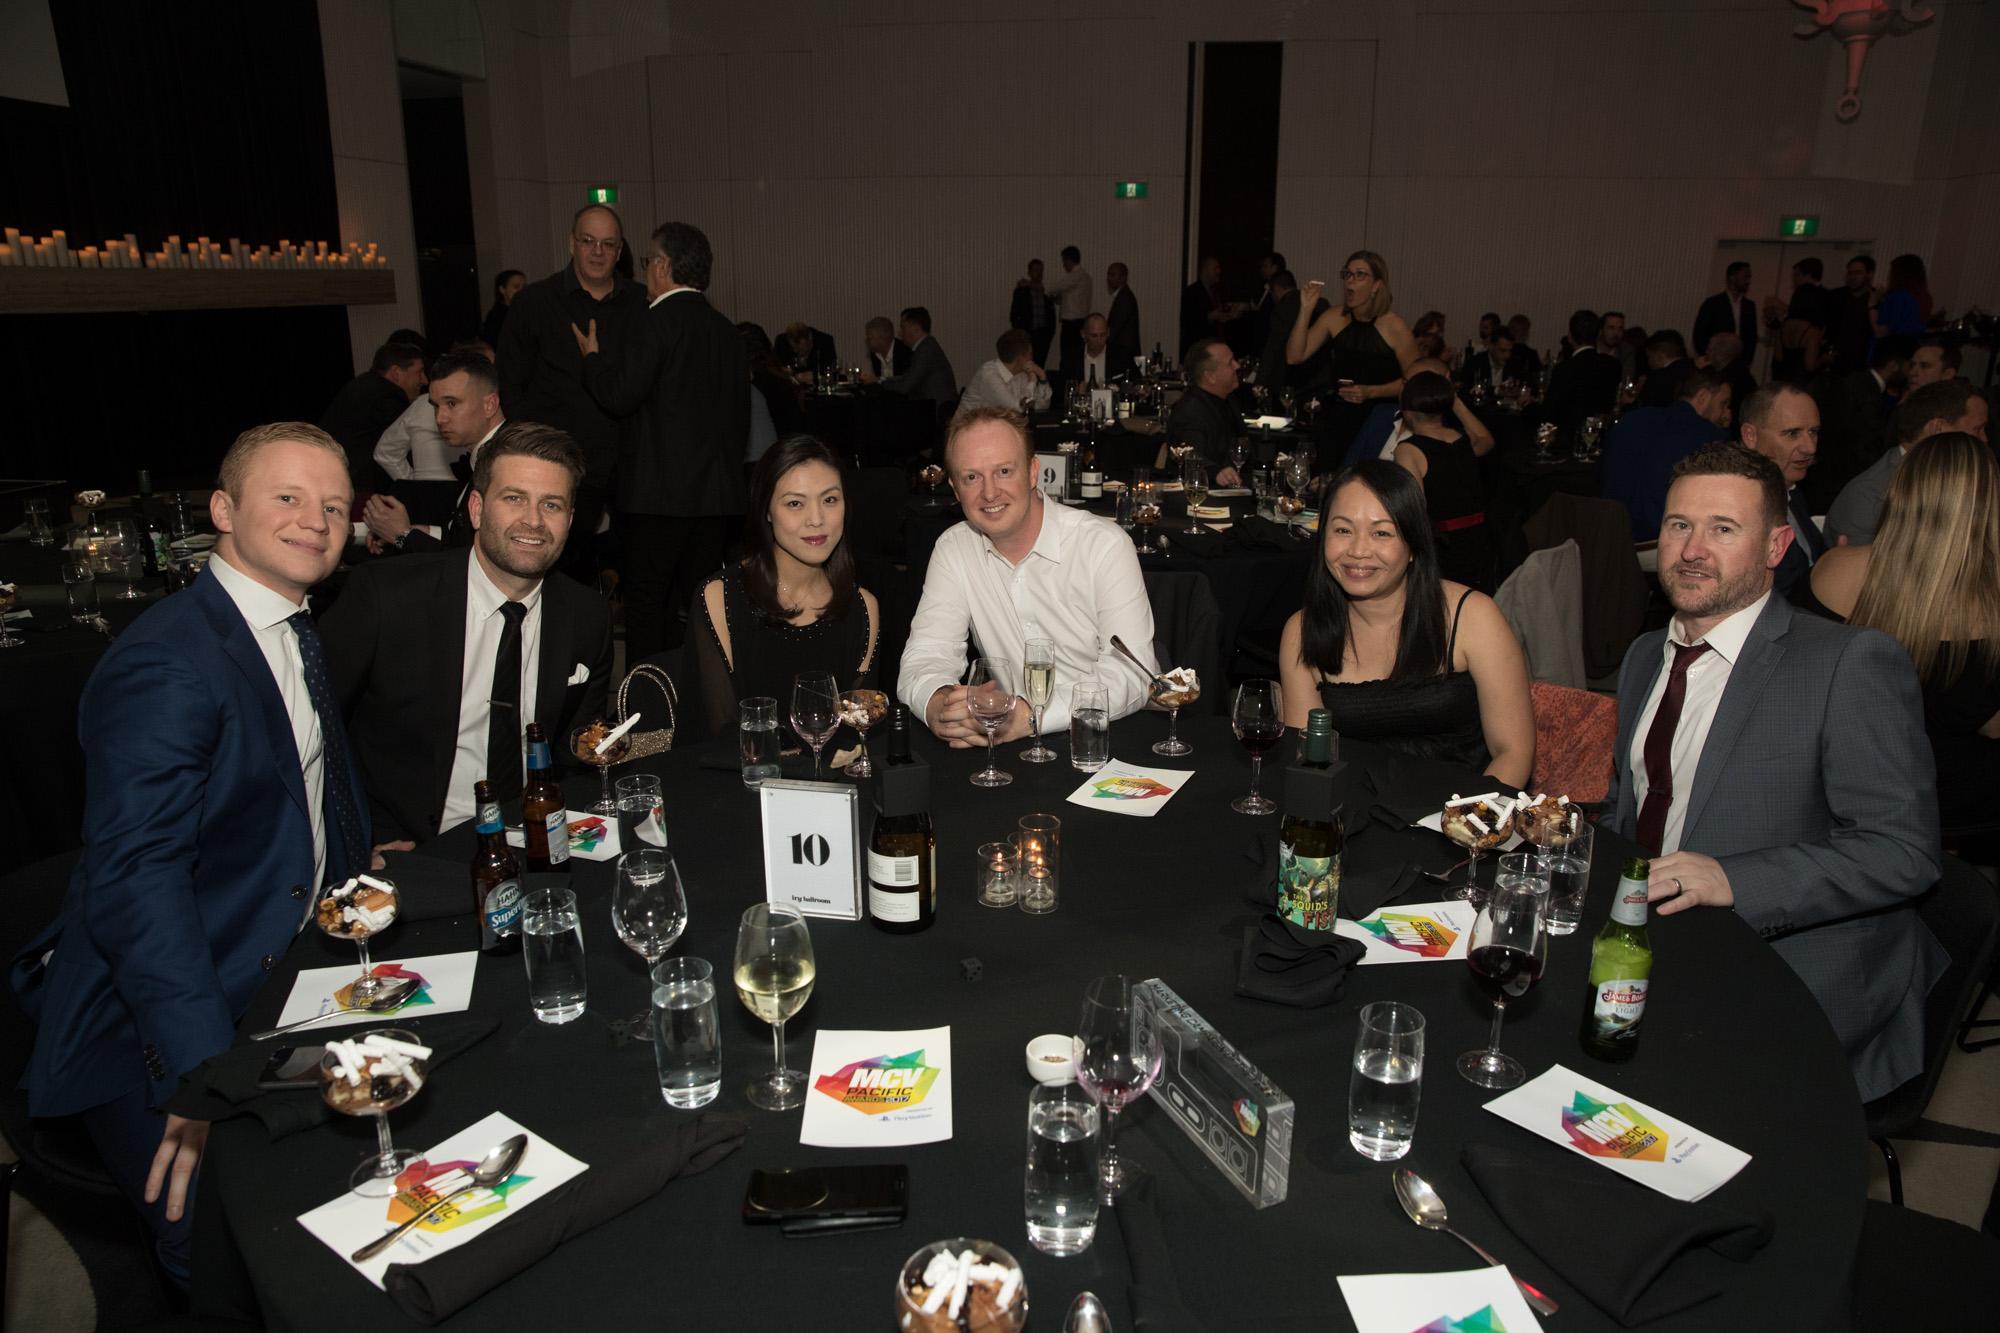 MCV_Pacific_Awards_1_June_17_PS_169.jpg